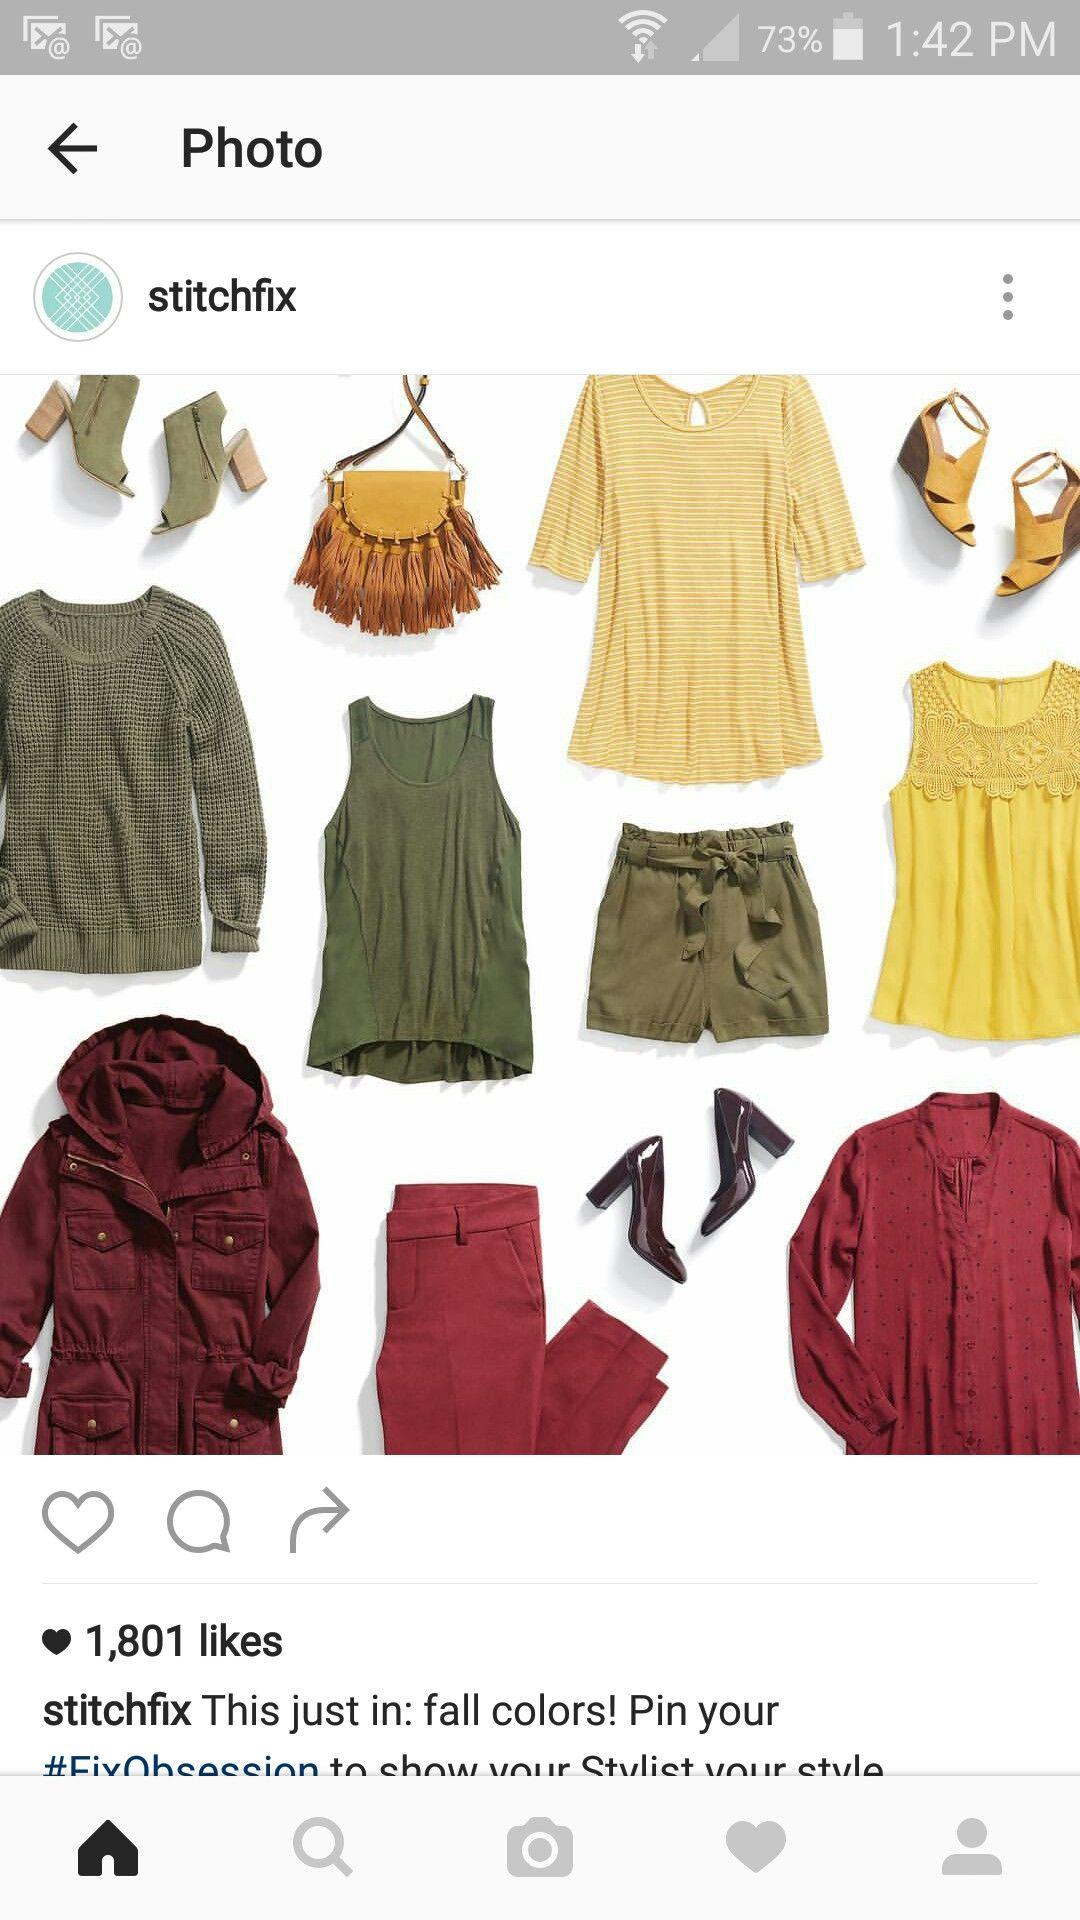 Love the green sweater and burgundy anorak!